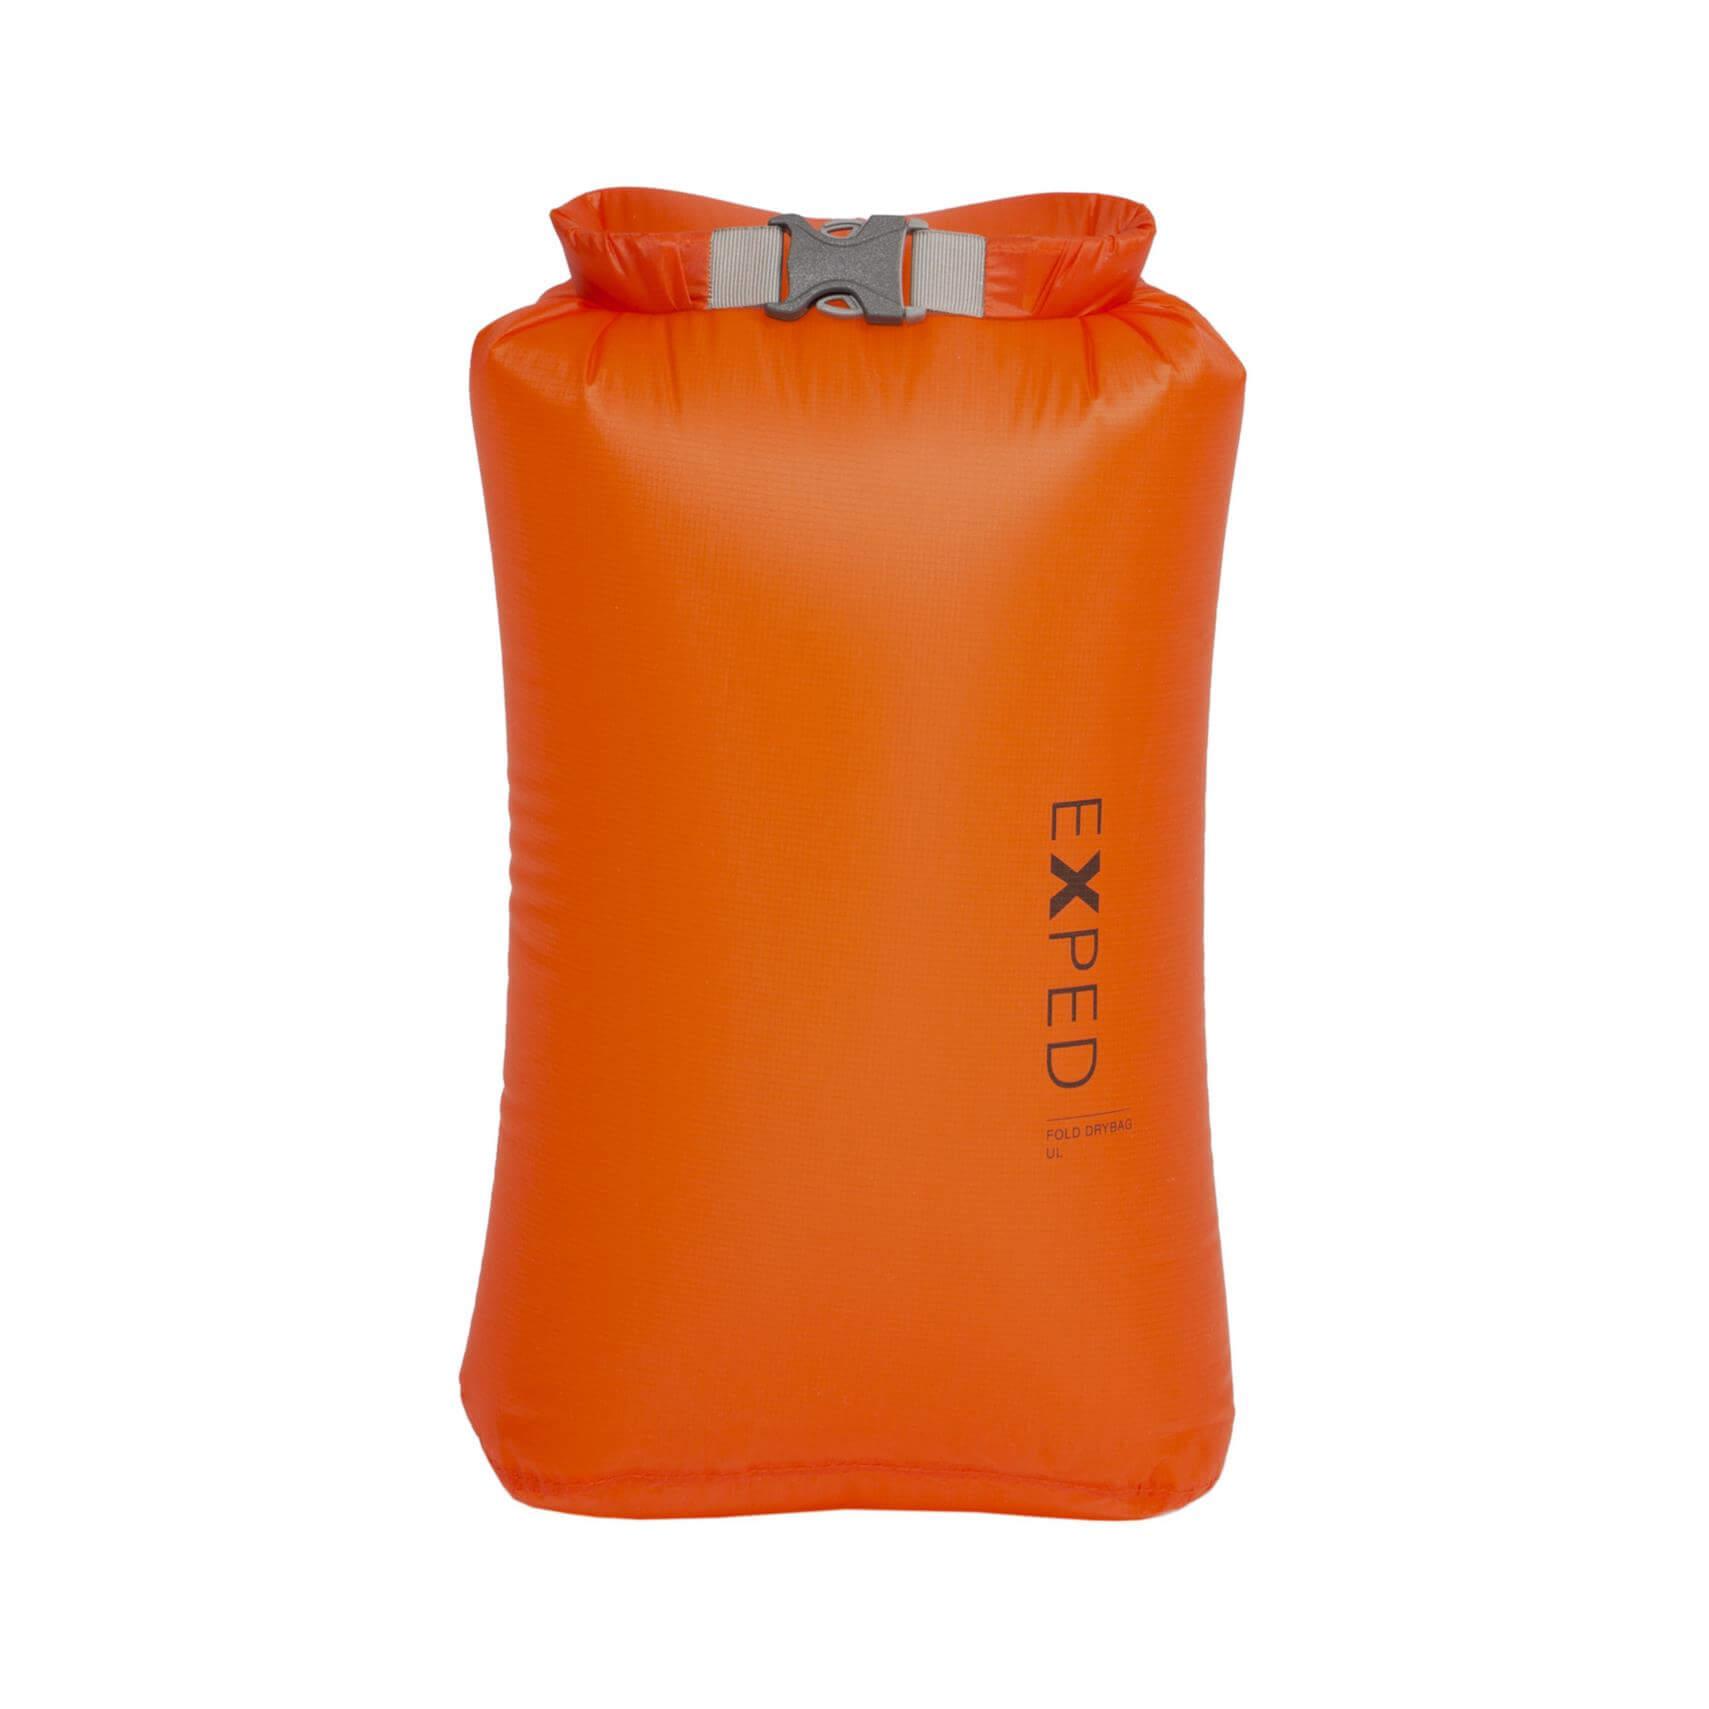 Image of Exped Fold Drybag UL XS Packsack orange